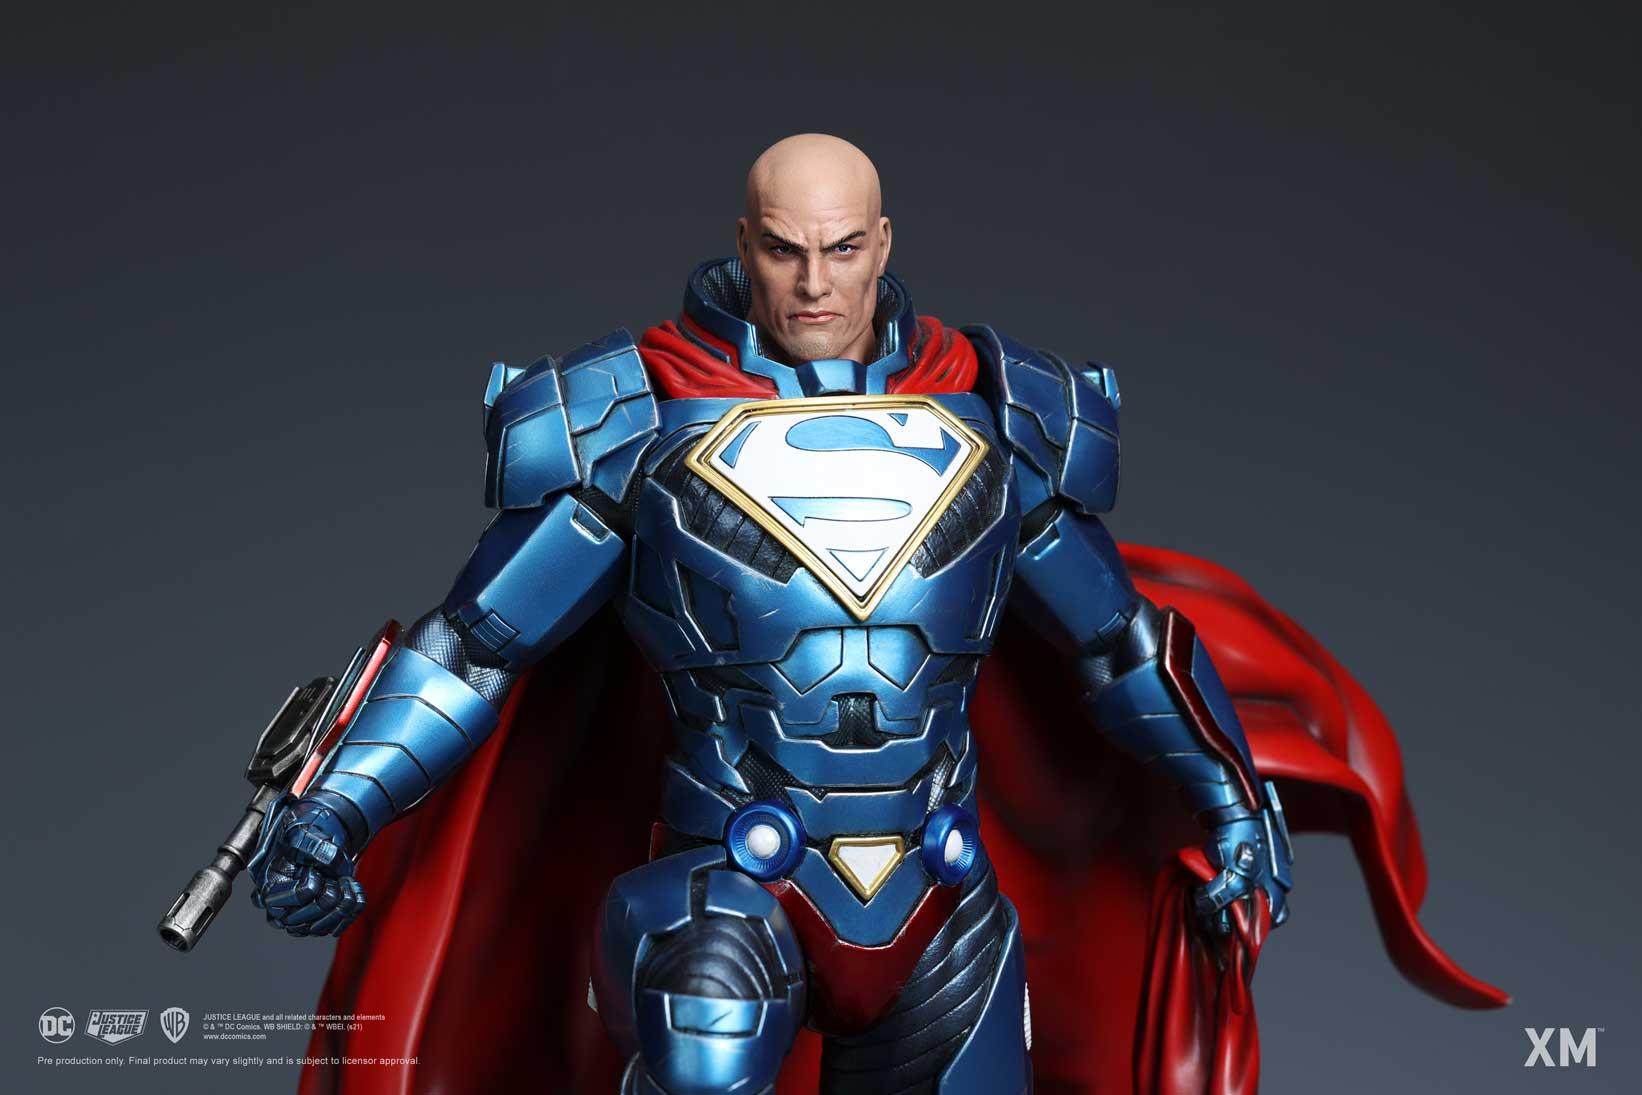 Link a Xm Studios_Lex_Luthor_Superman_DC- (9)